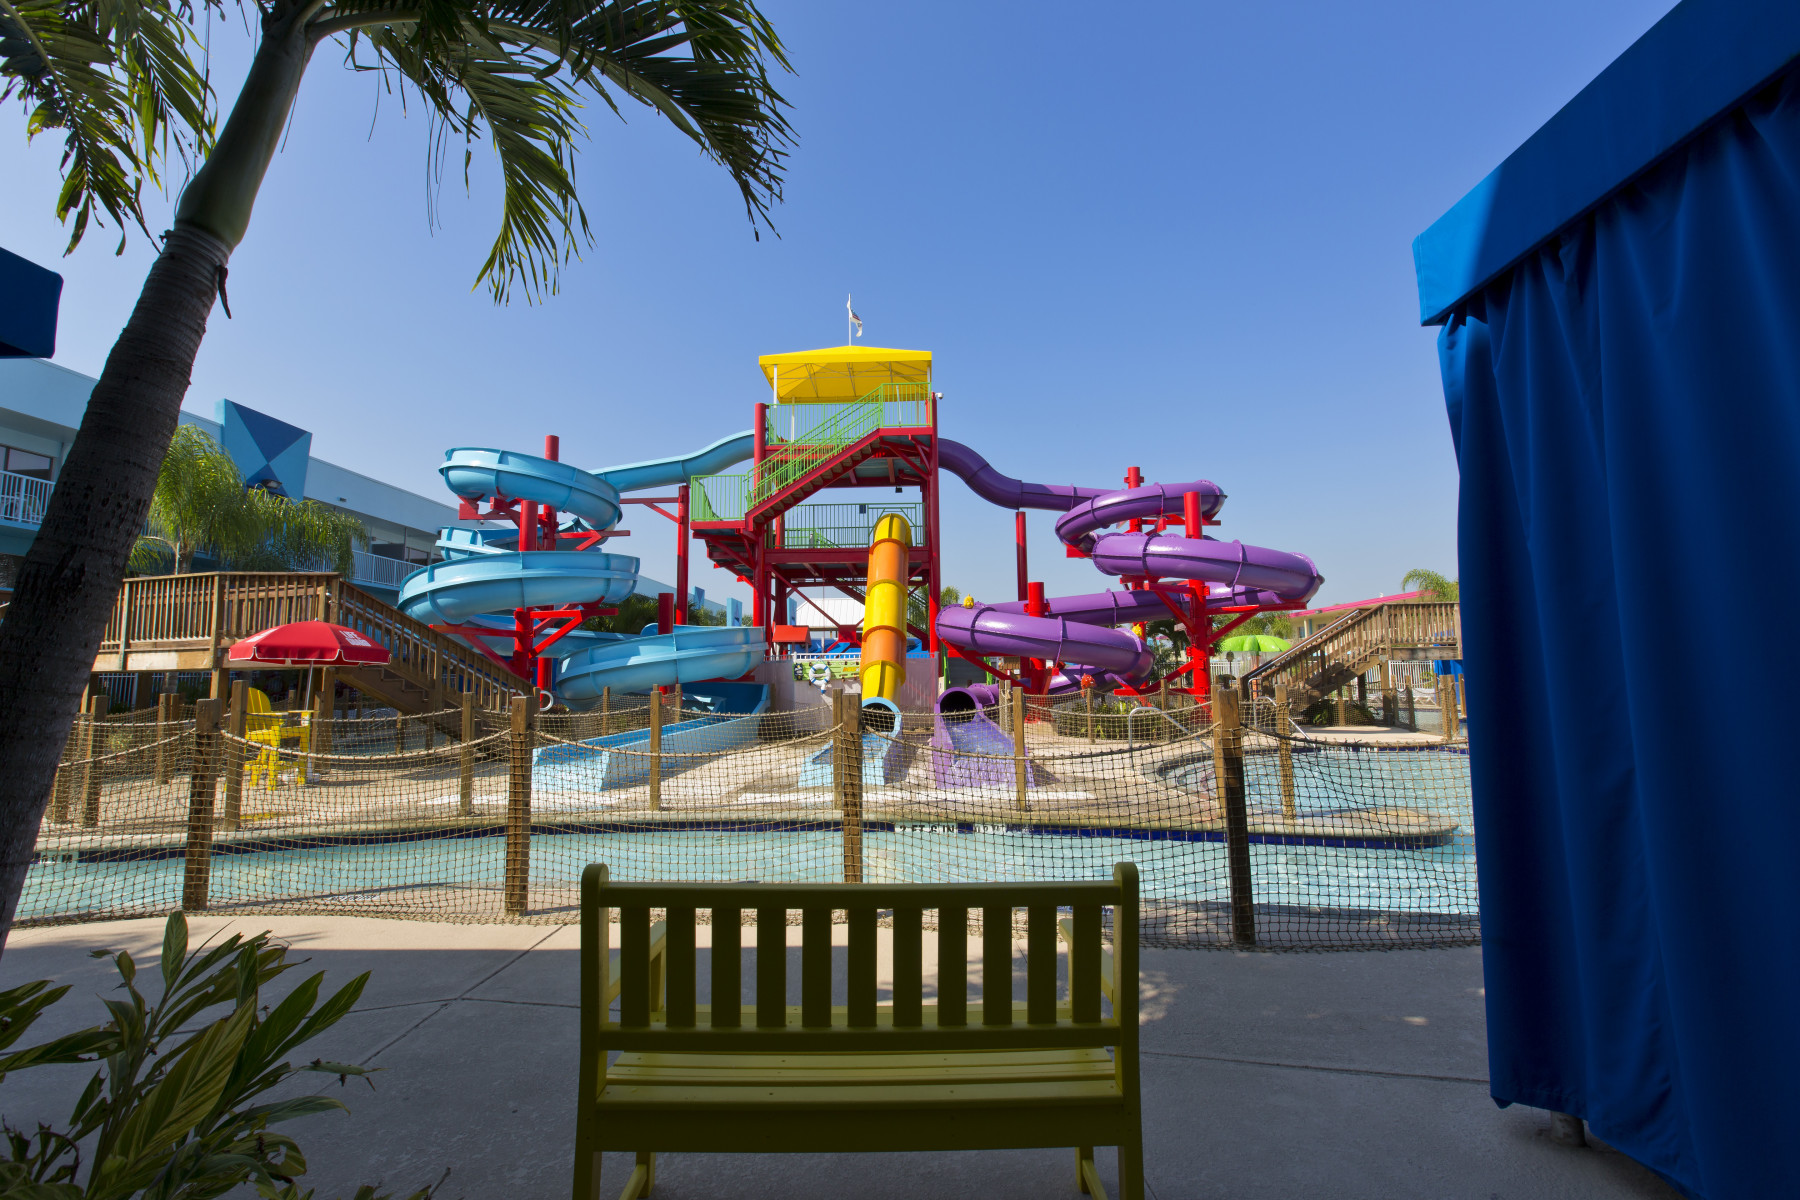 flamingo waterpark resort experience kissimmee. Black Bedroom Furniture Sets. Home Design Ideas